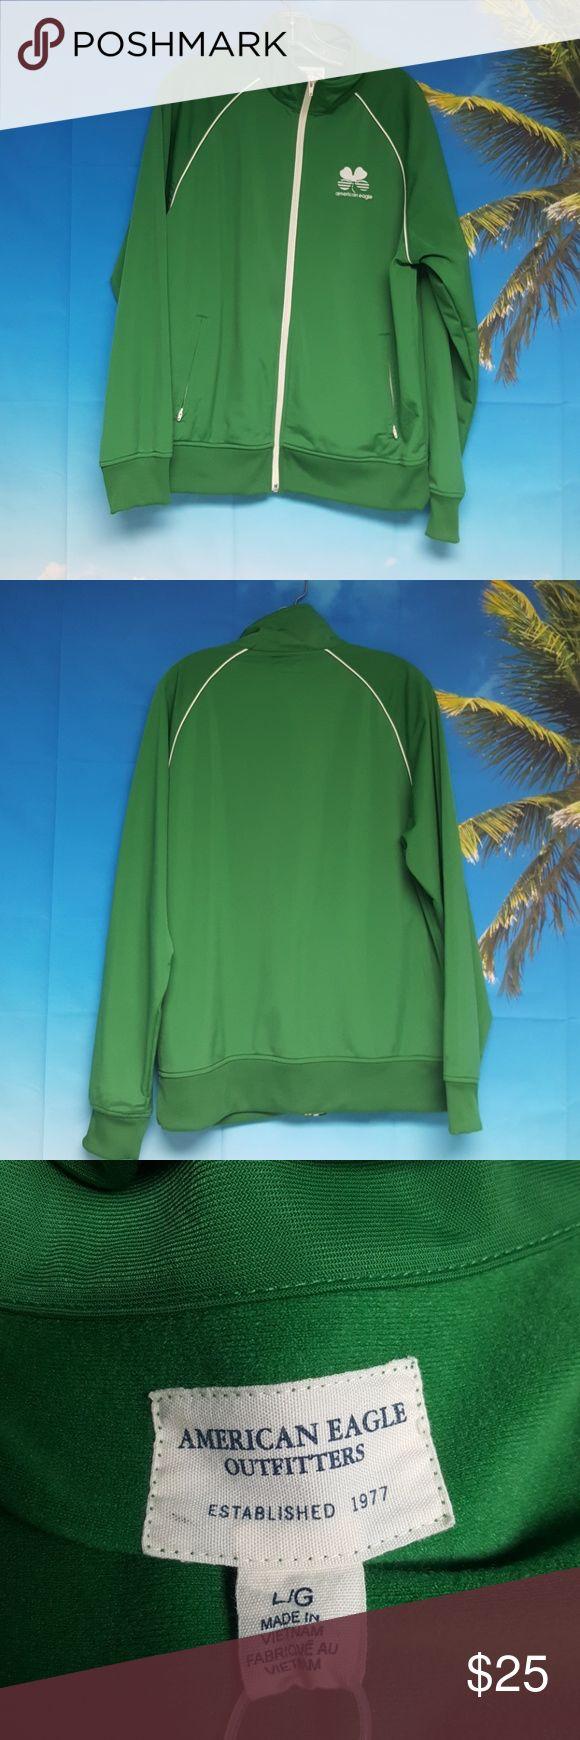 AMERICAN EAGLE JACKET Zippered jacket 2 zippered pockets American Eagle Outfitters Jackets & Coats